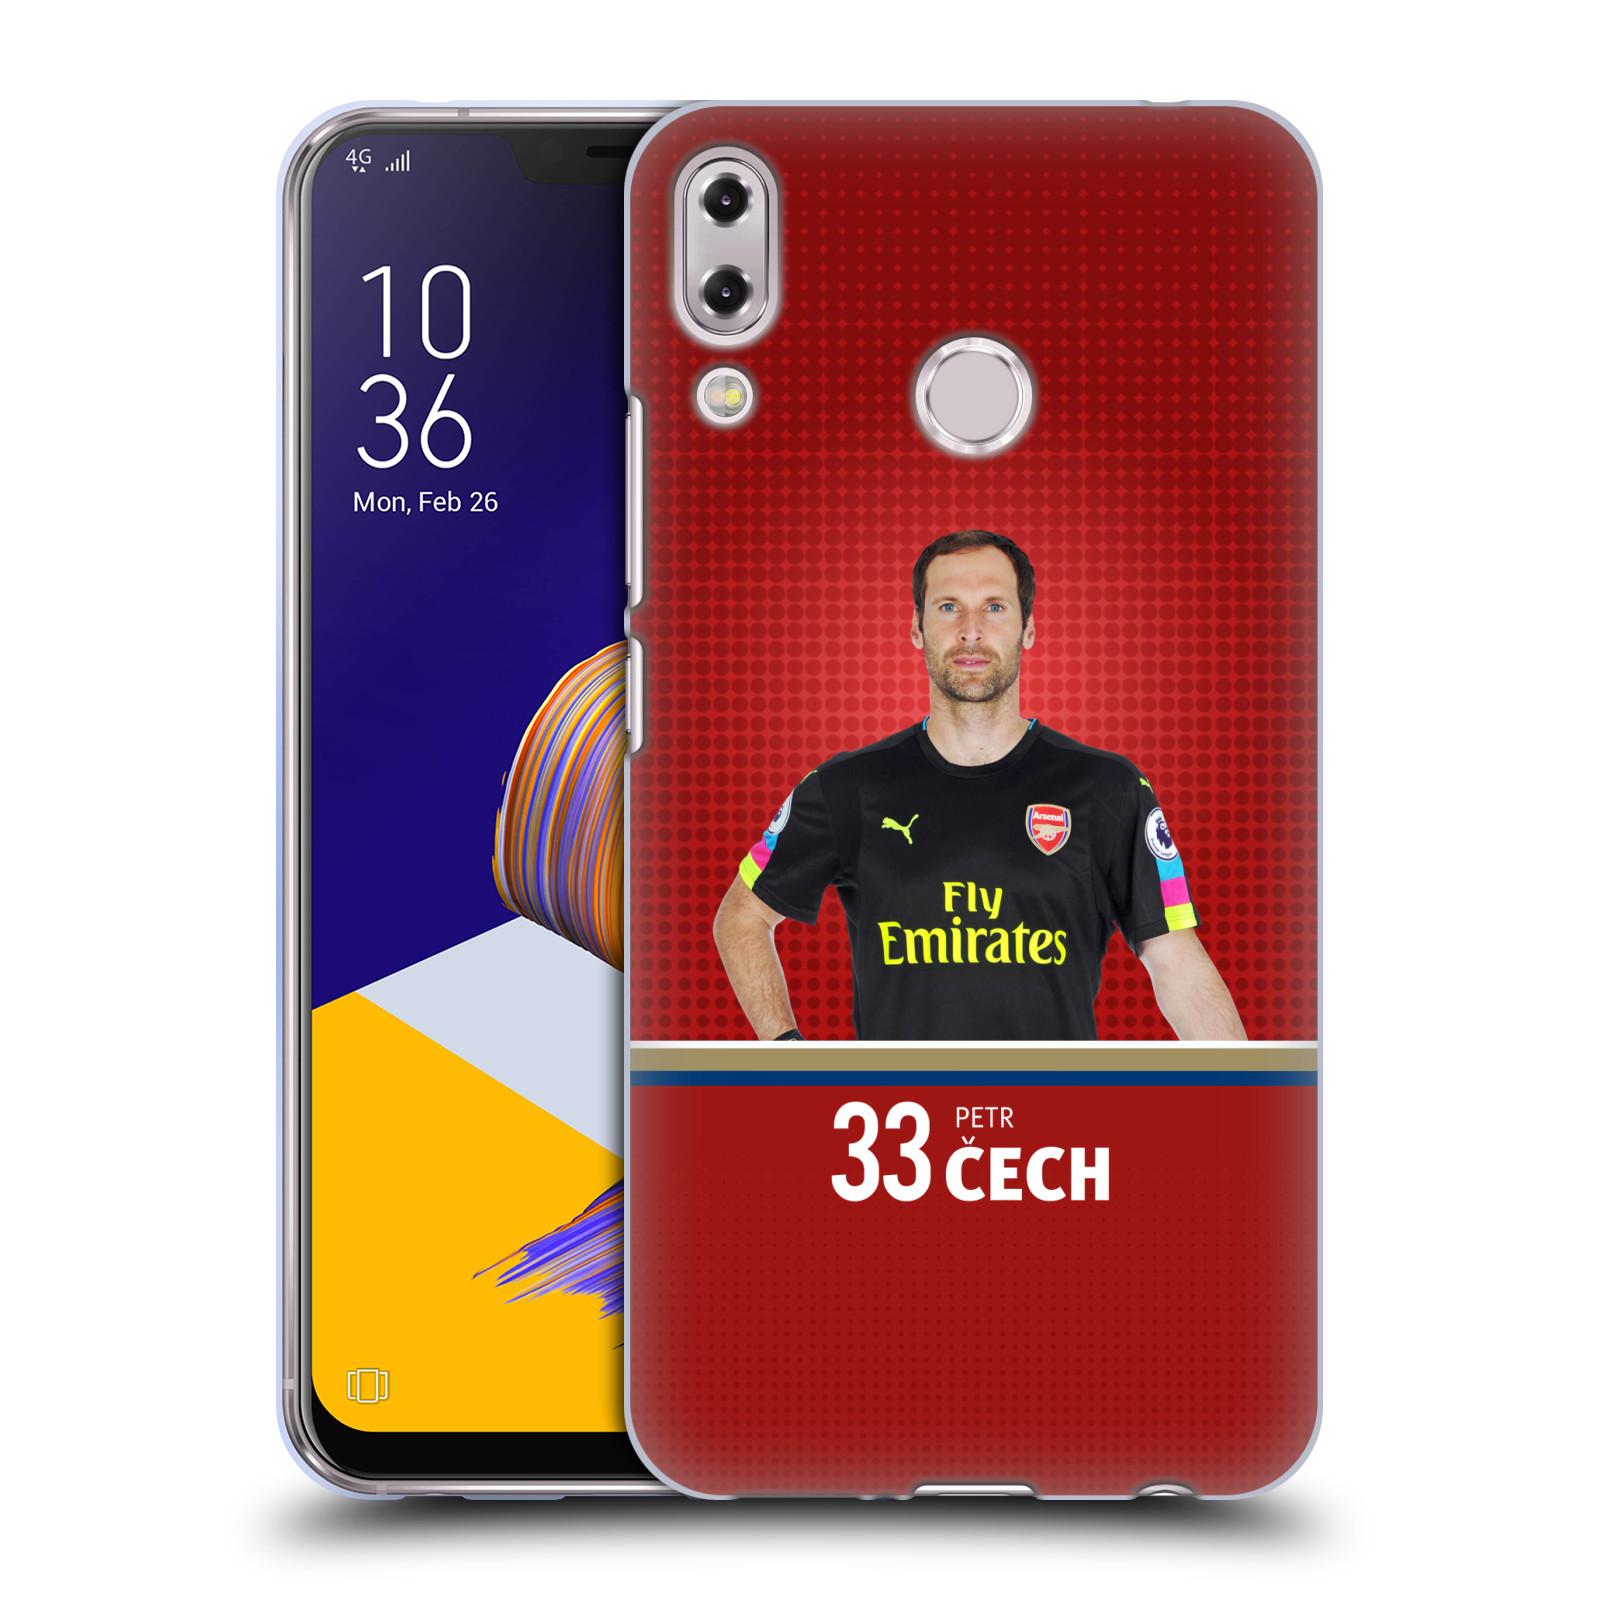 Silikonové pouzdro na mobil Asus Zenfone 5z ZS620KL - Head Case - Arsenal FC - Petr Čech